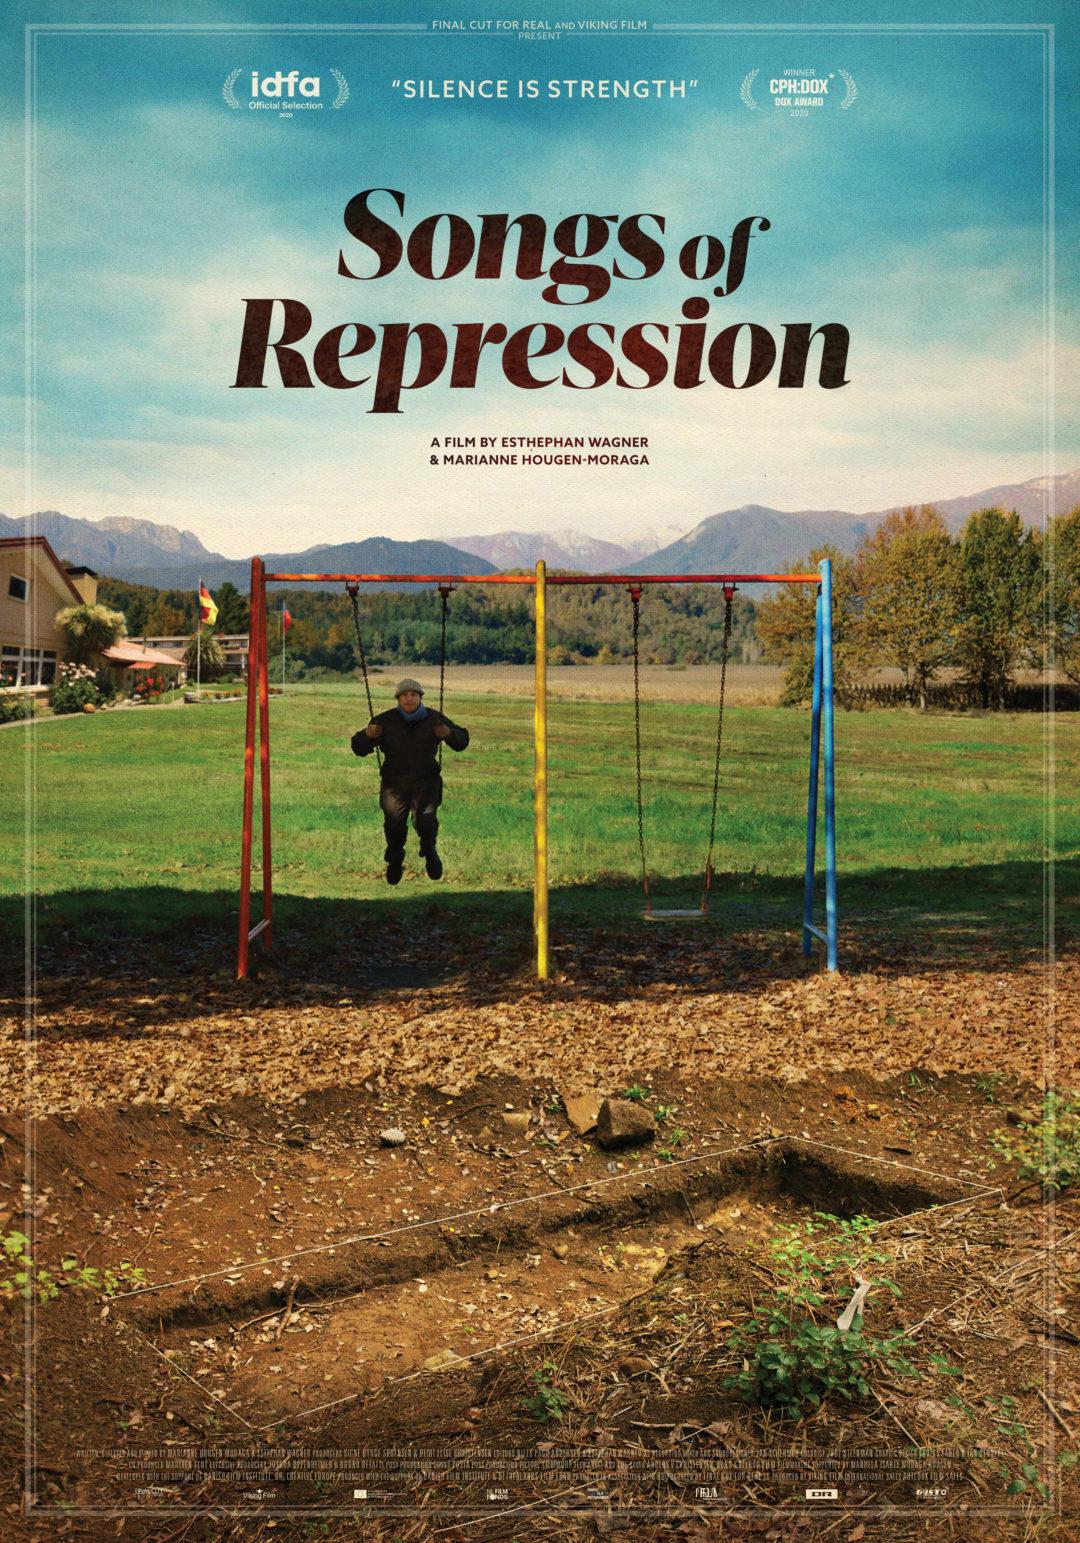 Songs-of-Repression_ps_1_jpg_sd-high.jpg